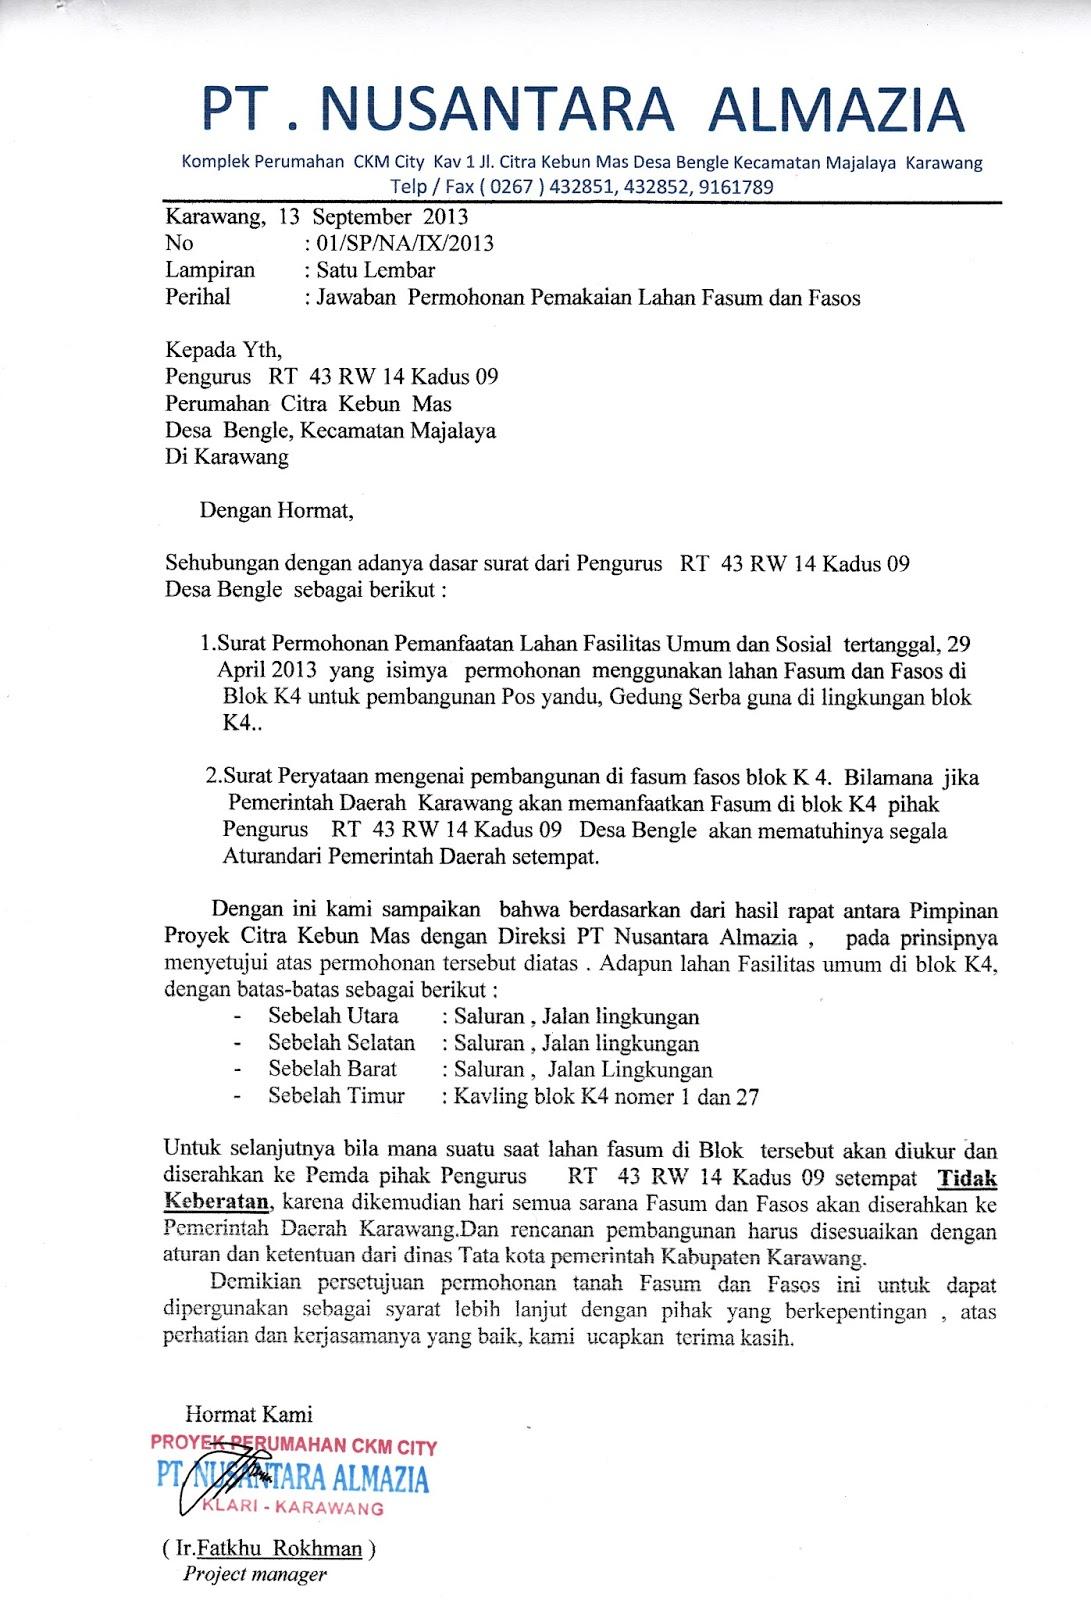 Contoh Surat Izin Penggunaan Fasos Surat 28